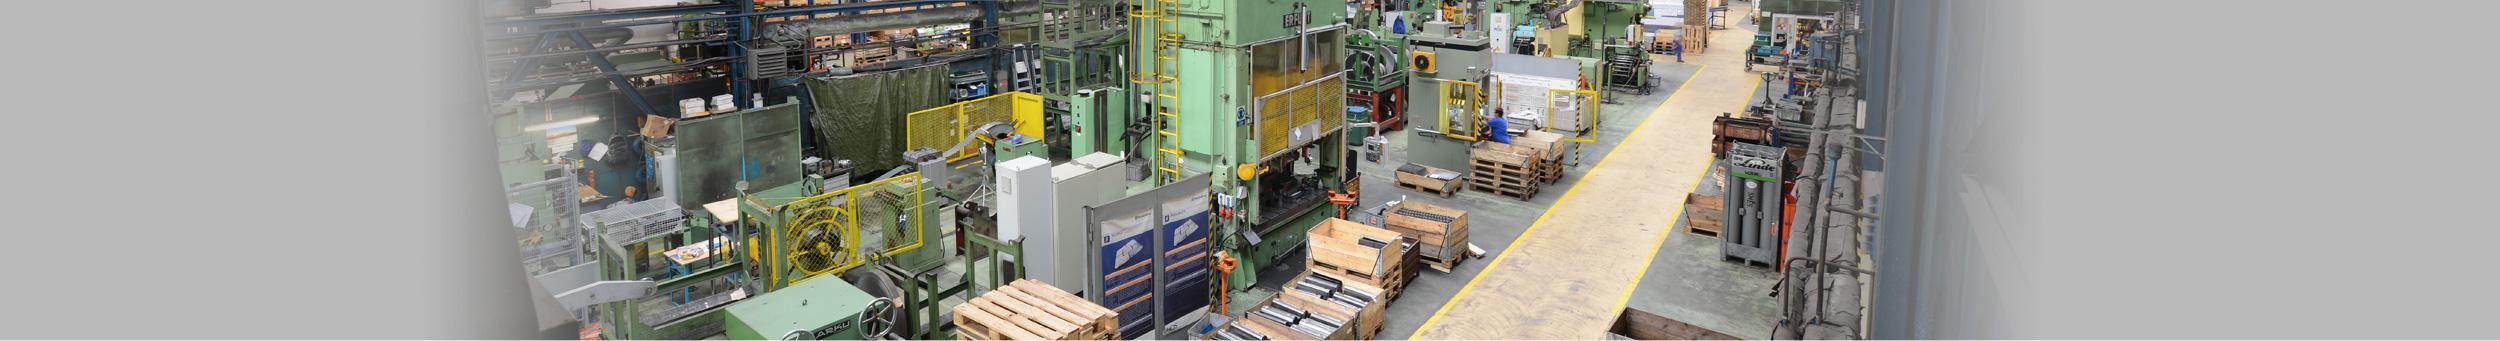 Pressing and machine shop